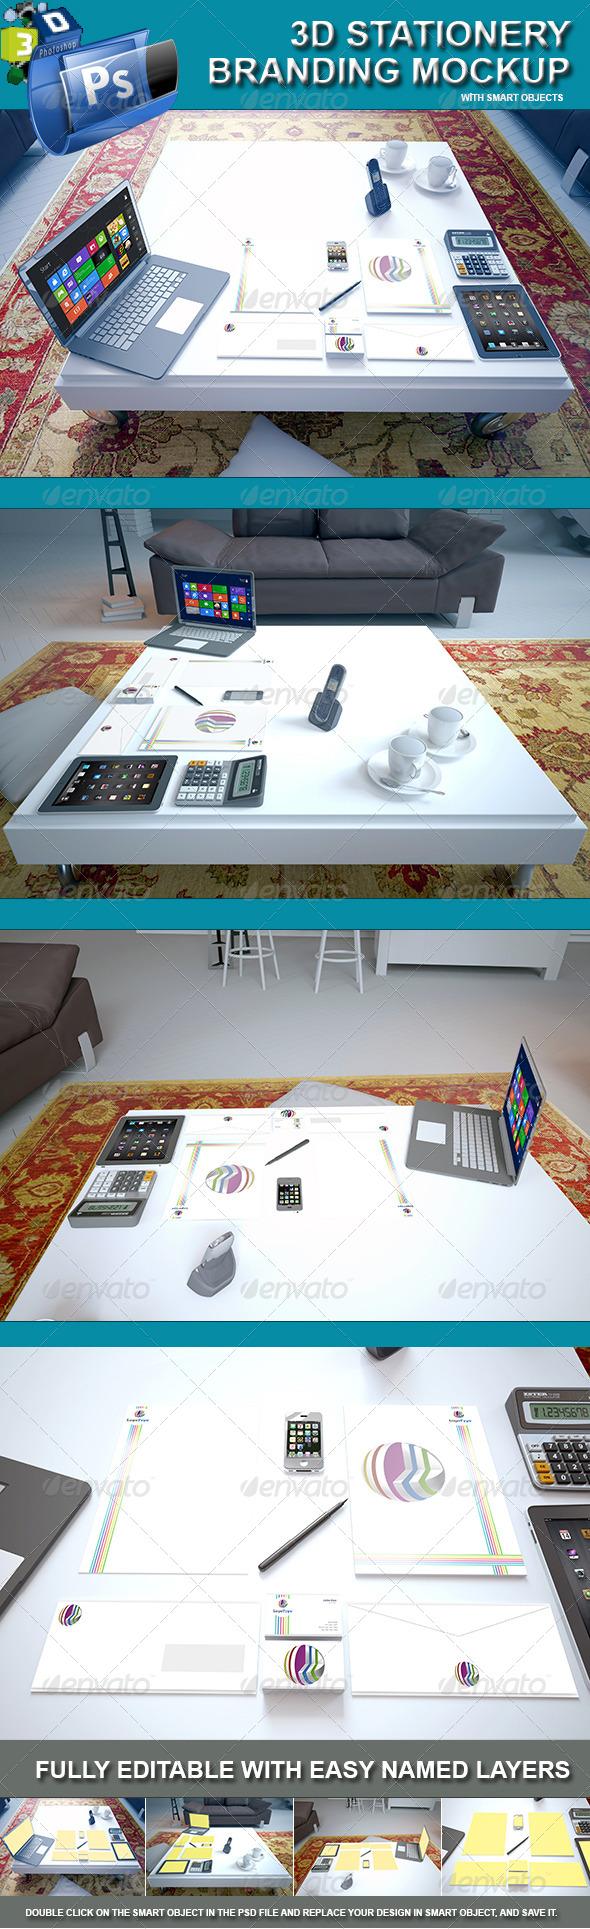 3d Stationery Branding Mockup - Living Room Scene - Stationery Print